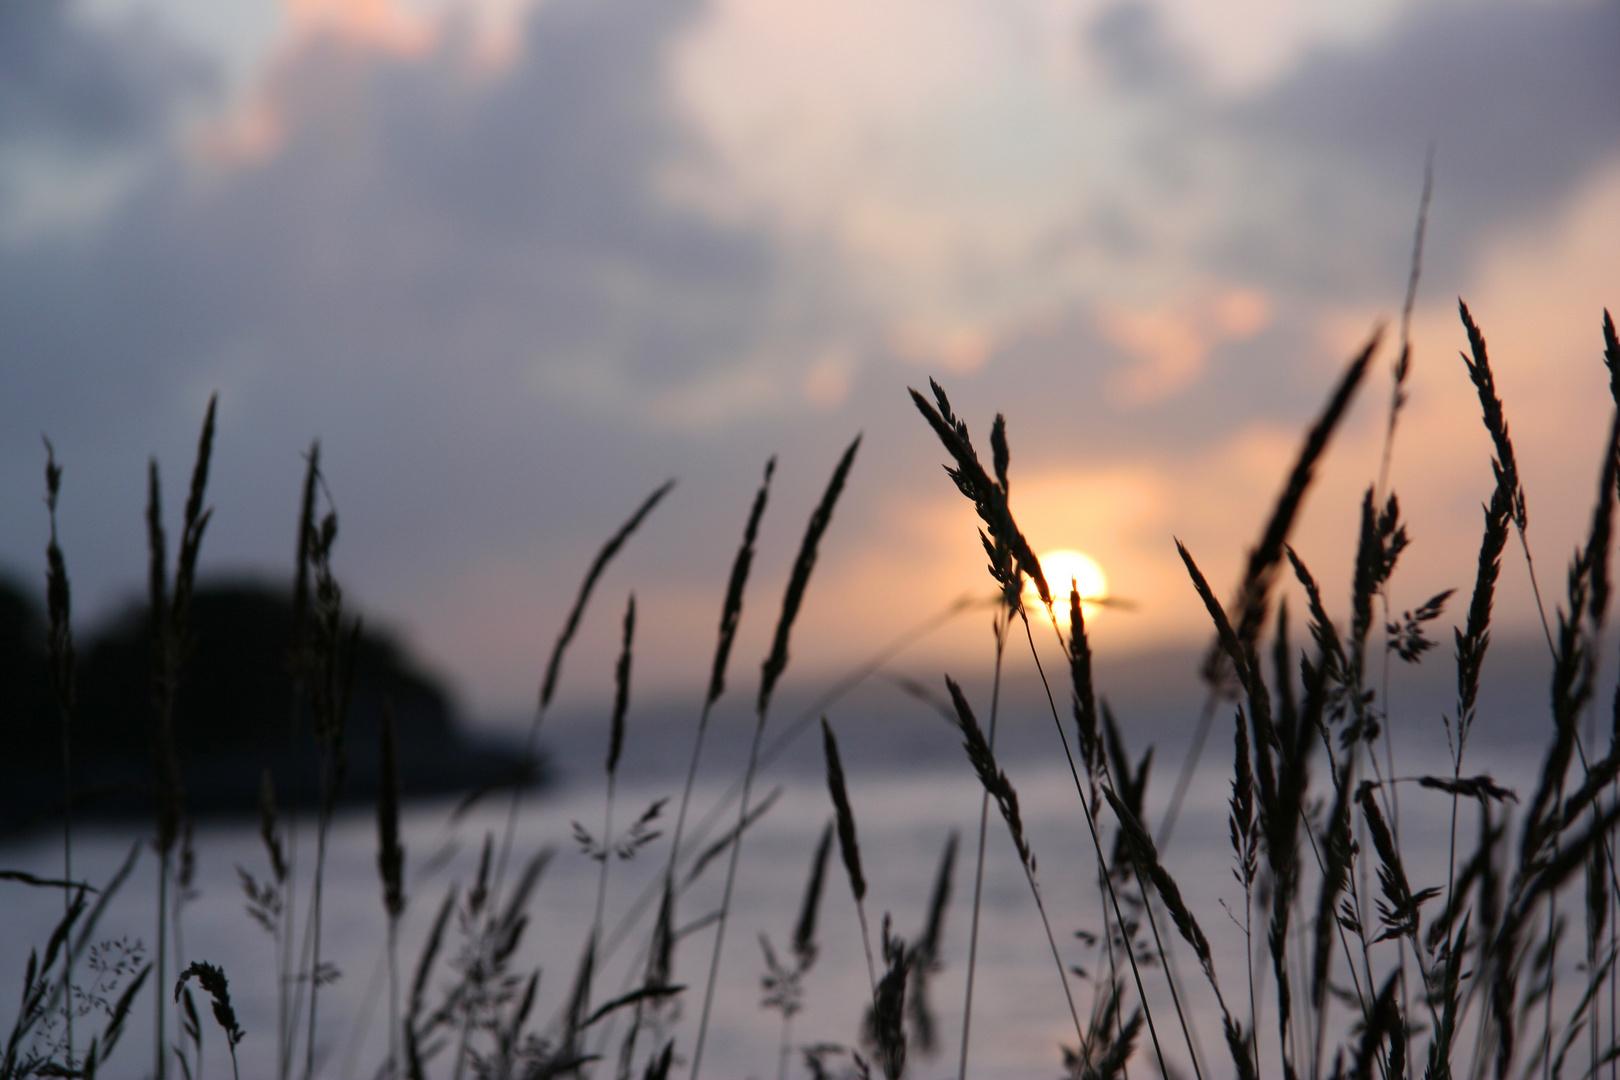 Grashalme an Meeresküste vor Sonnenuntergang